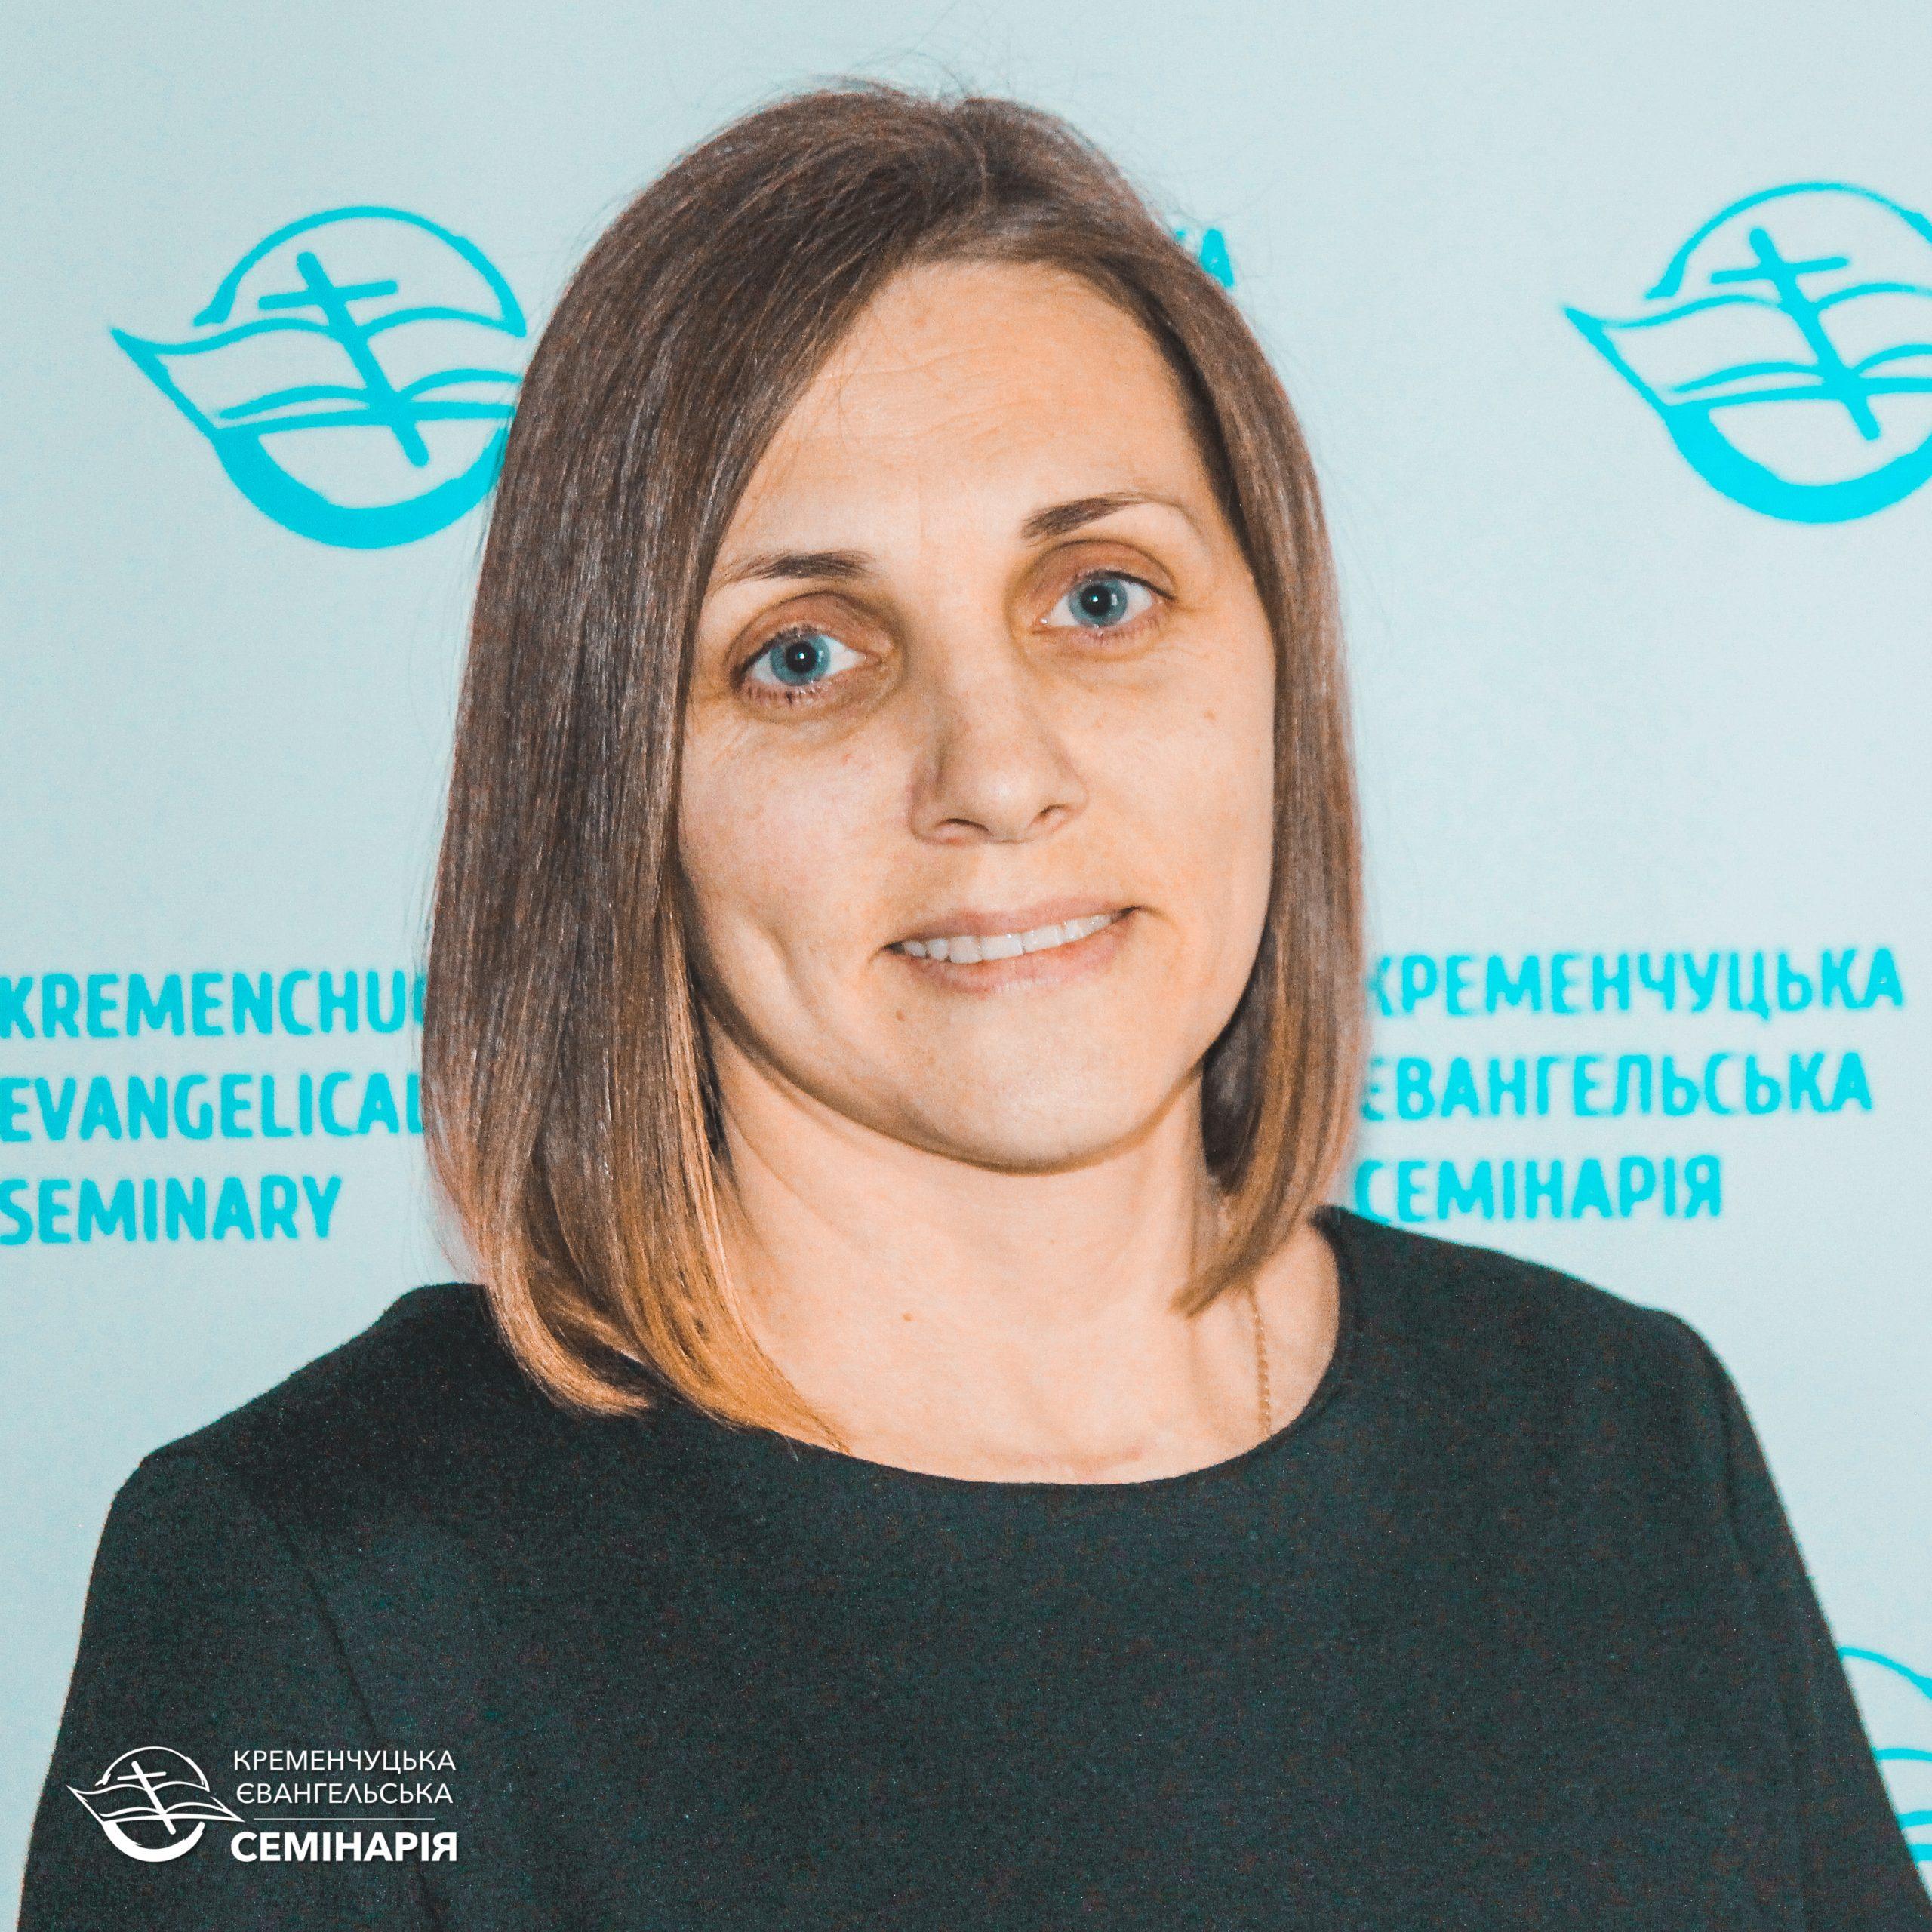 Шевчук Леся Алексеевна